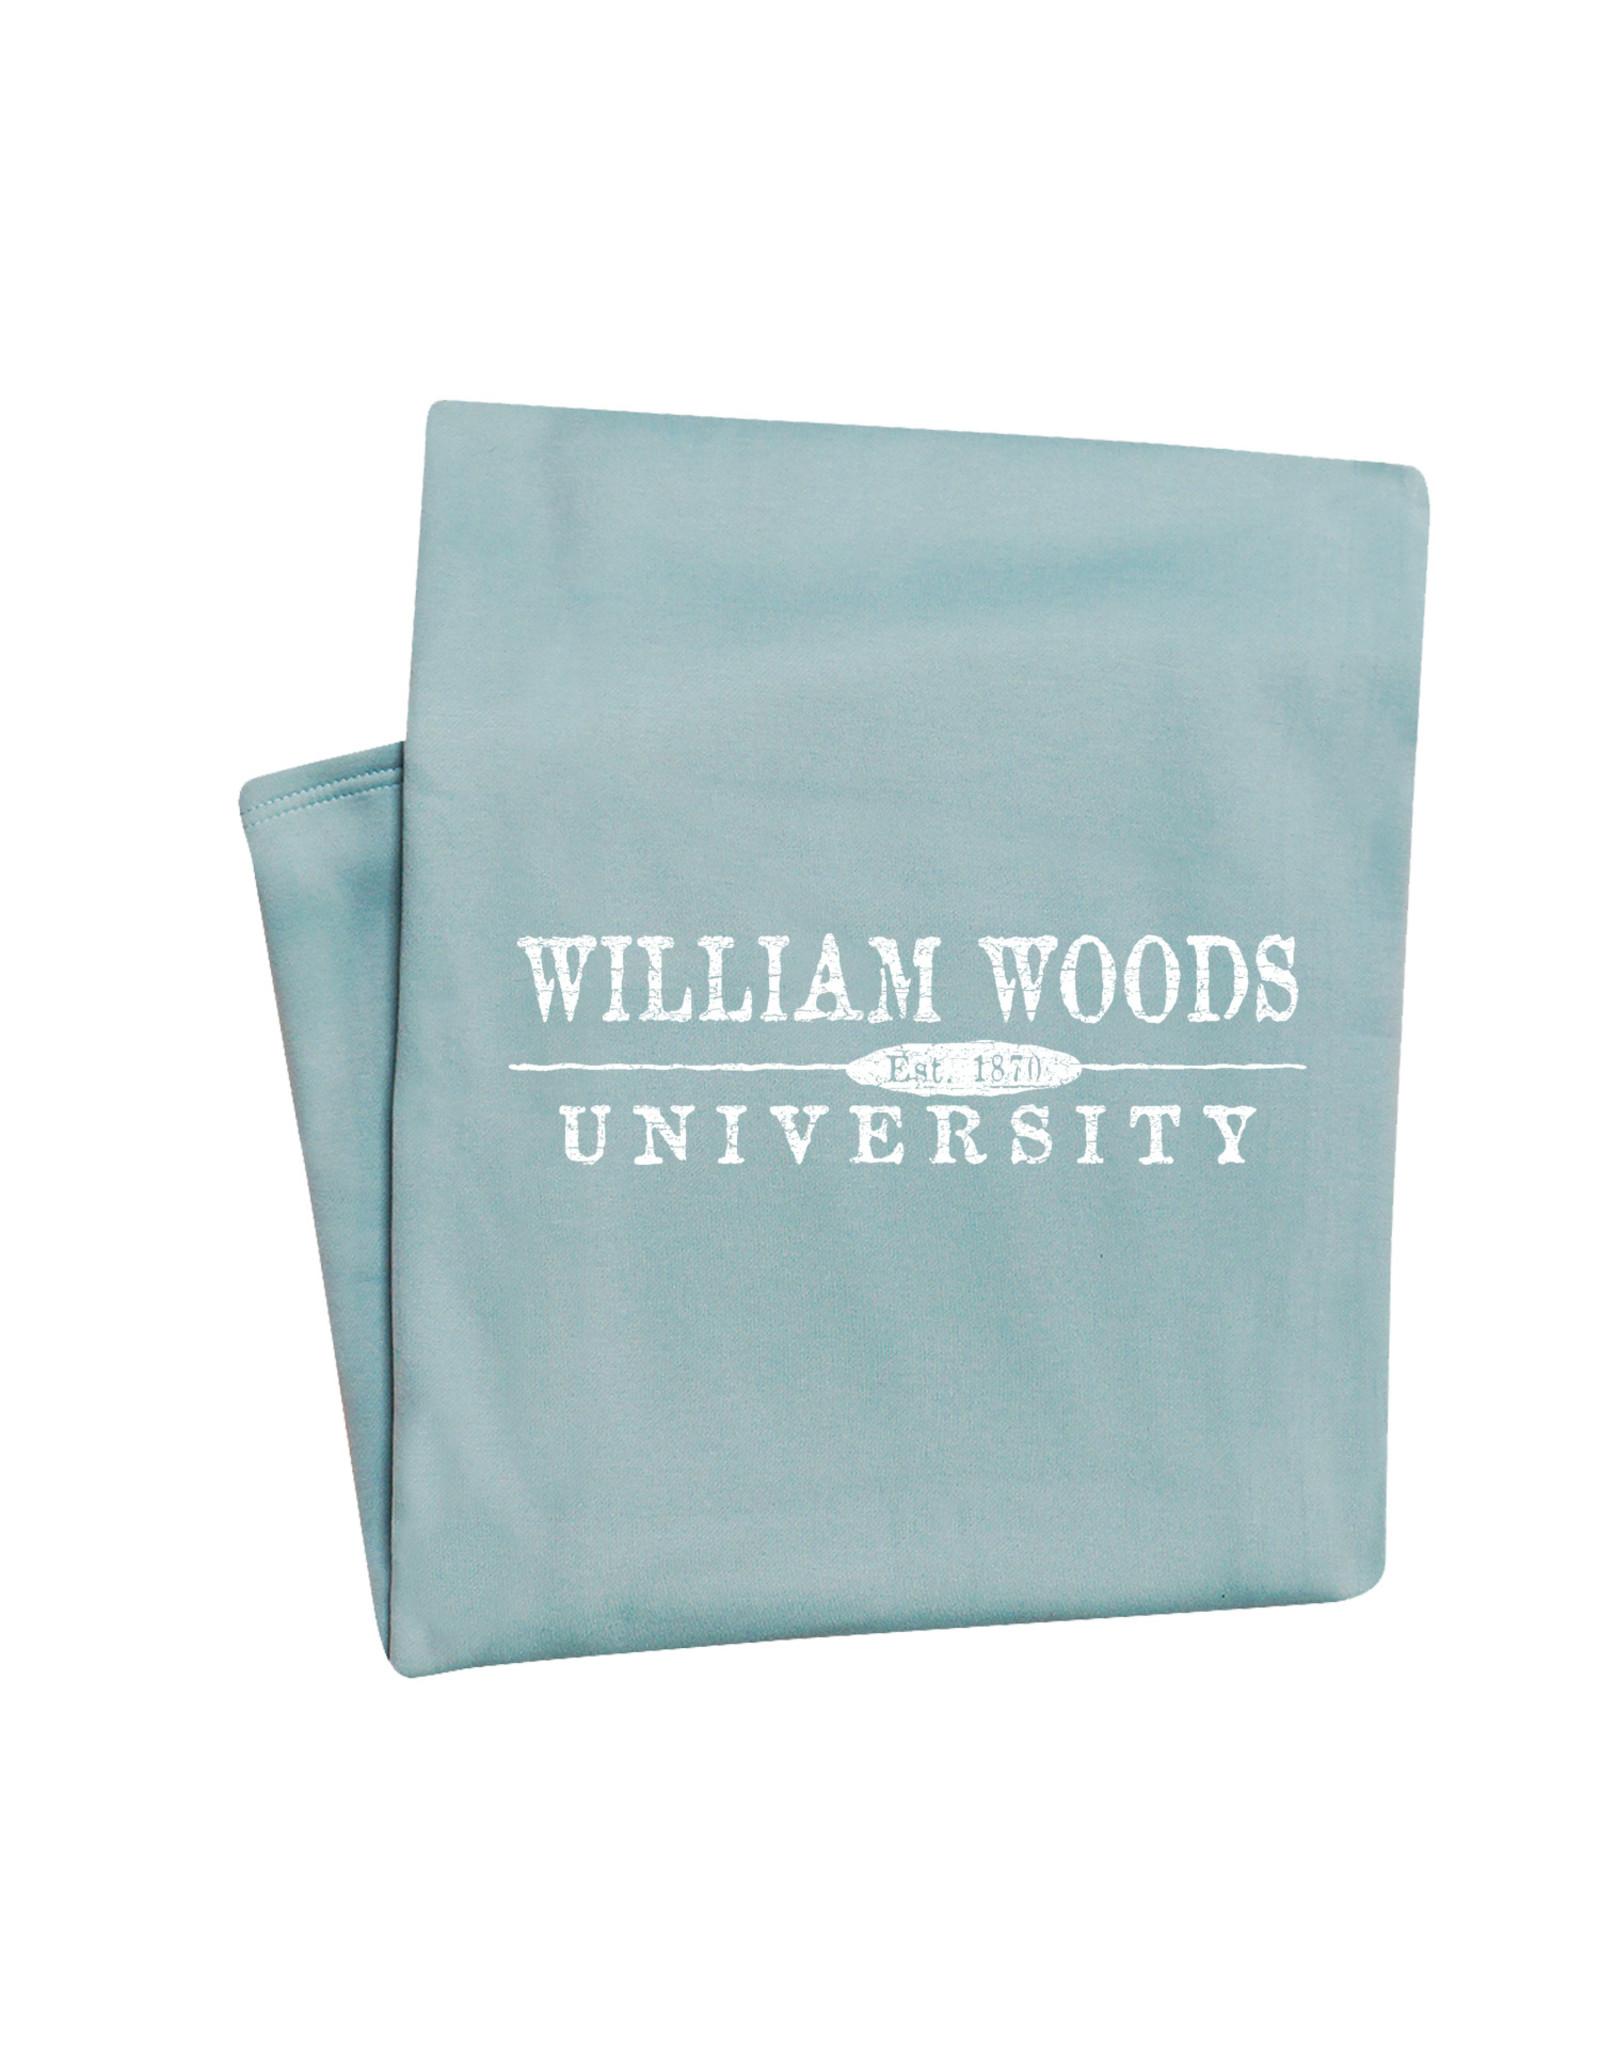 Pro Weave Sweatshirt Throw 40x52